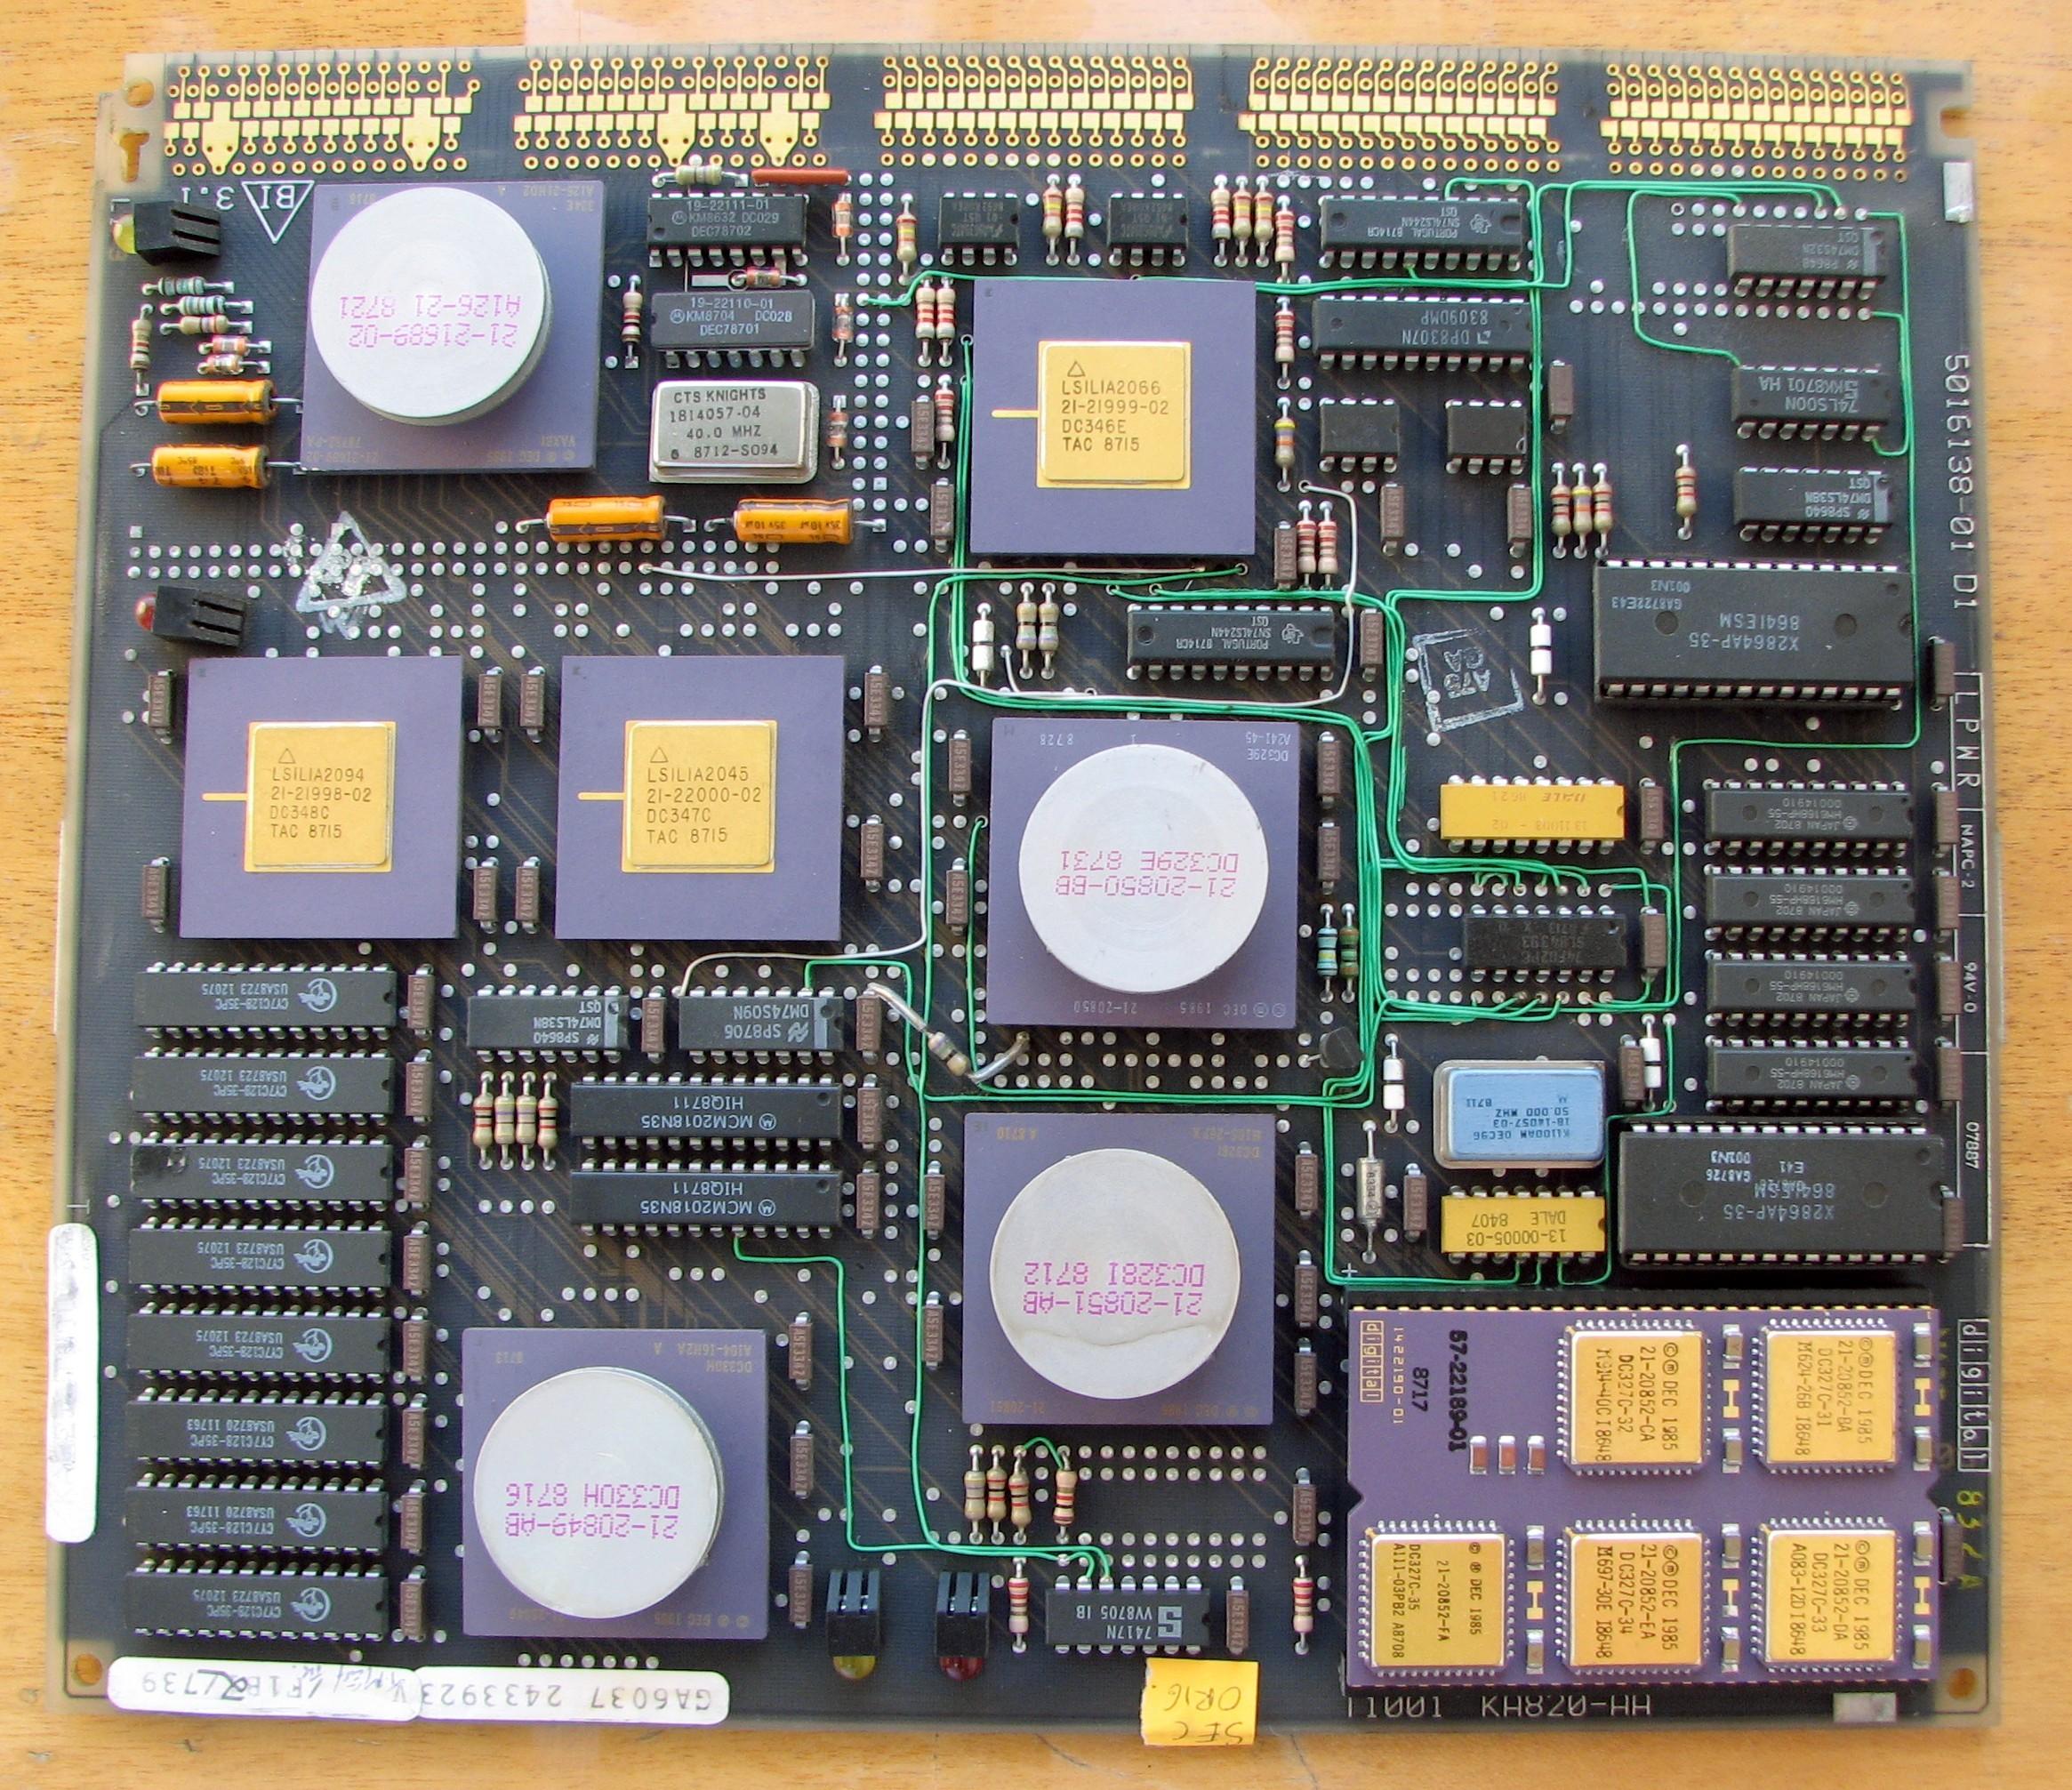 A KA820-AA CPU module from a VAX 8200 minicomputer containing a V-11 microprocessor chip set